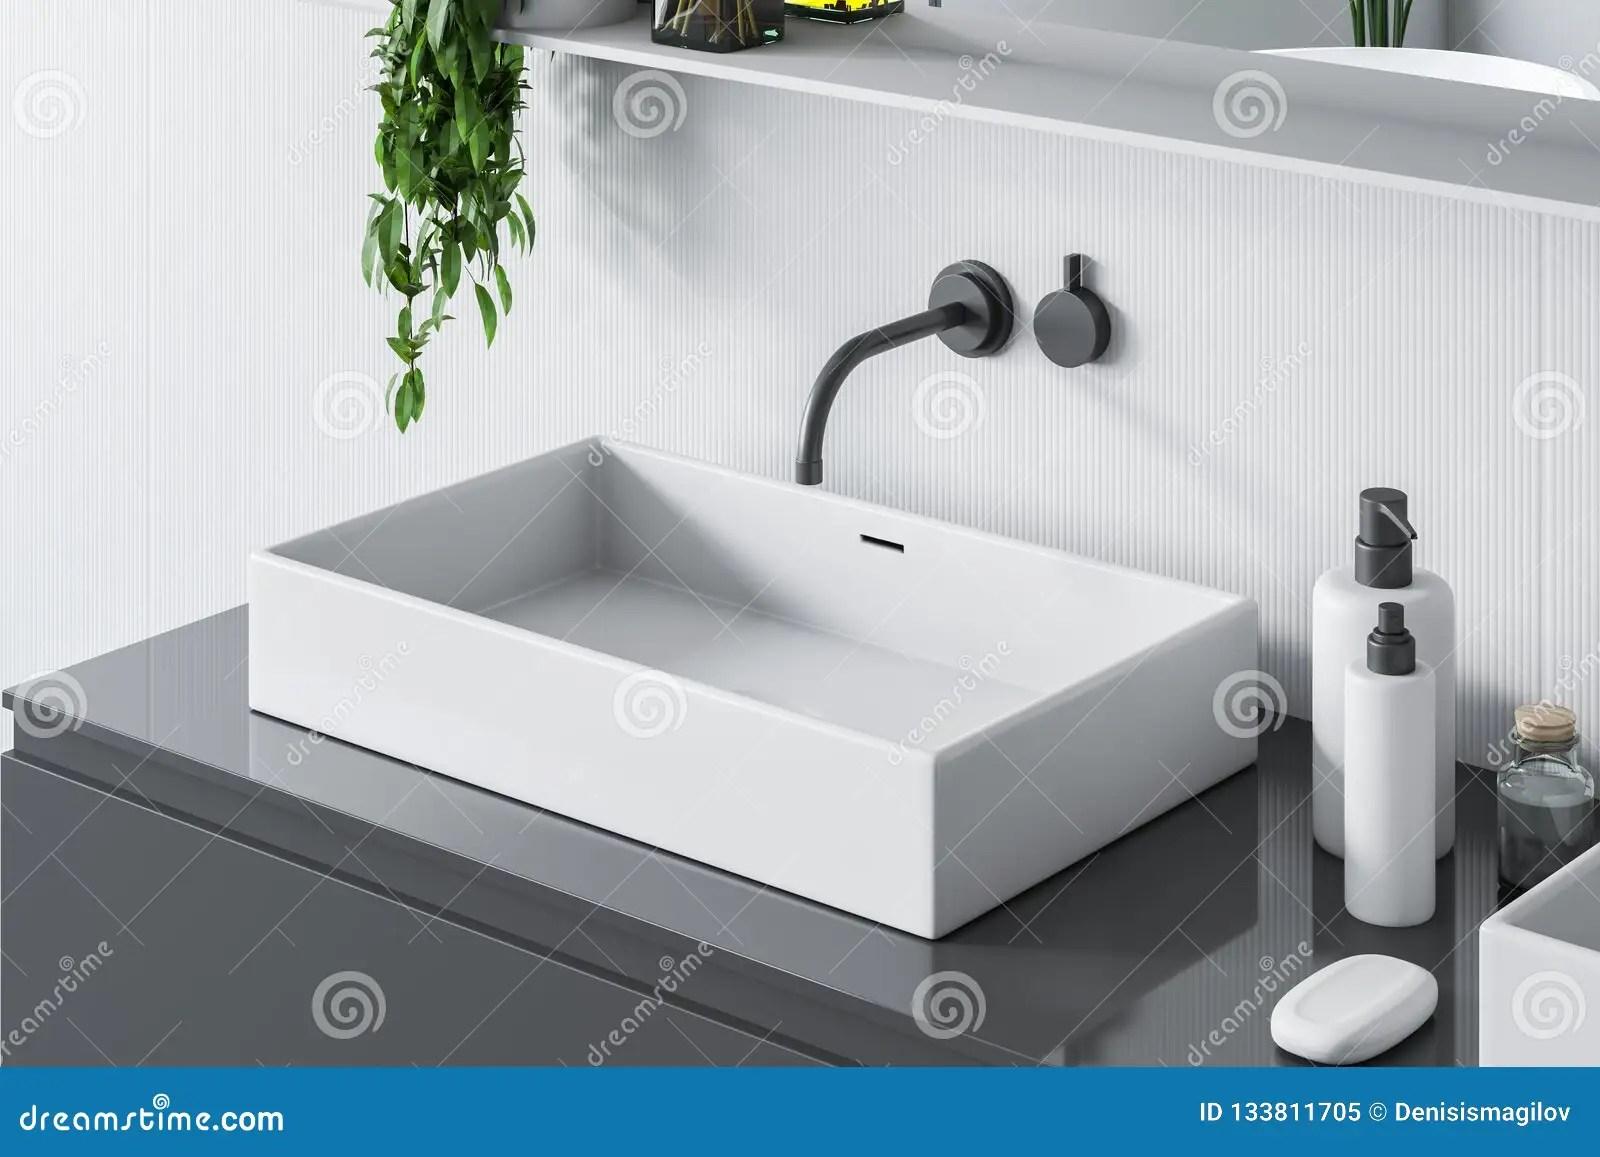 https www dreamstime com top view bathroom sink gray counter rectangular white standing countertop room walls mirror d rendering image133811705